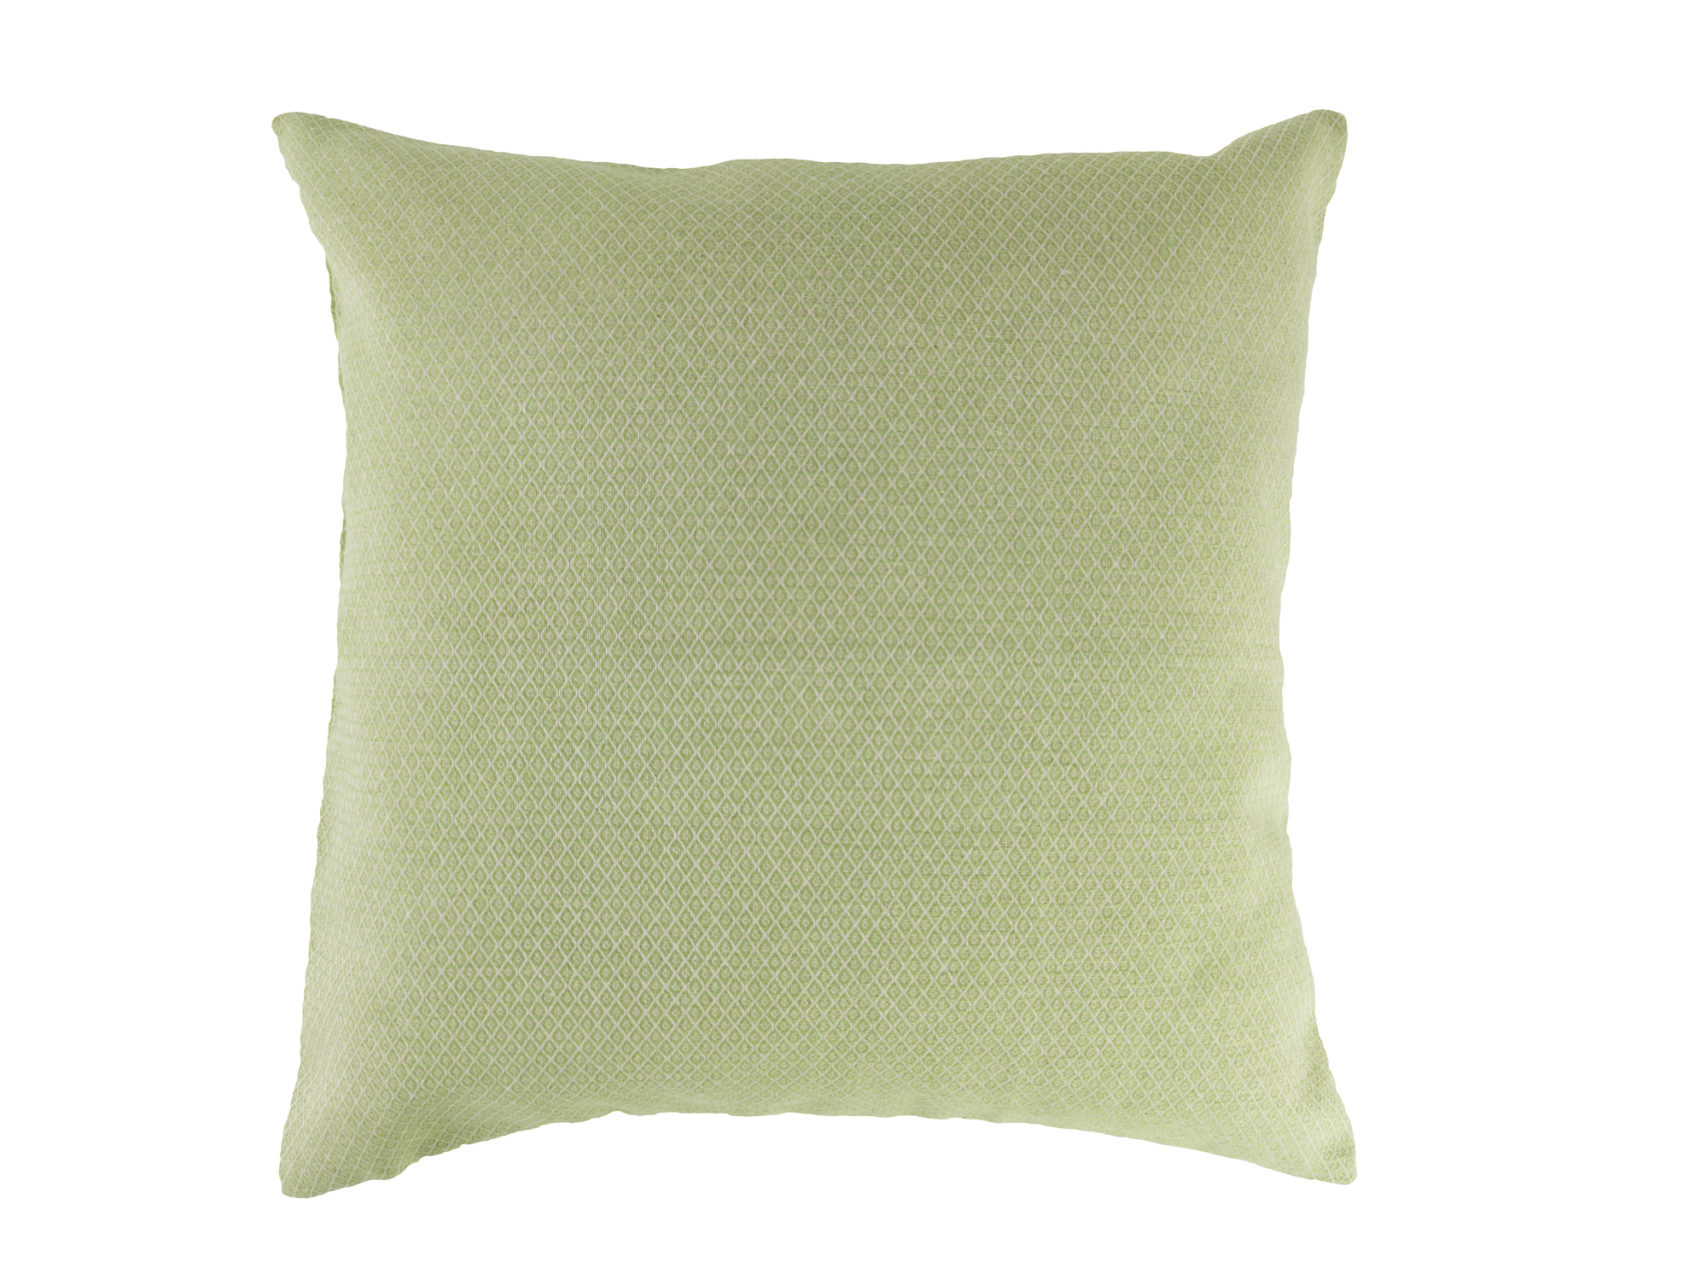 Kissen-40x40-cm-Rauten-hellgrün